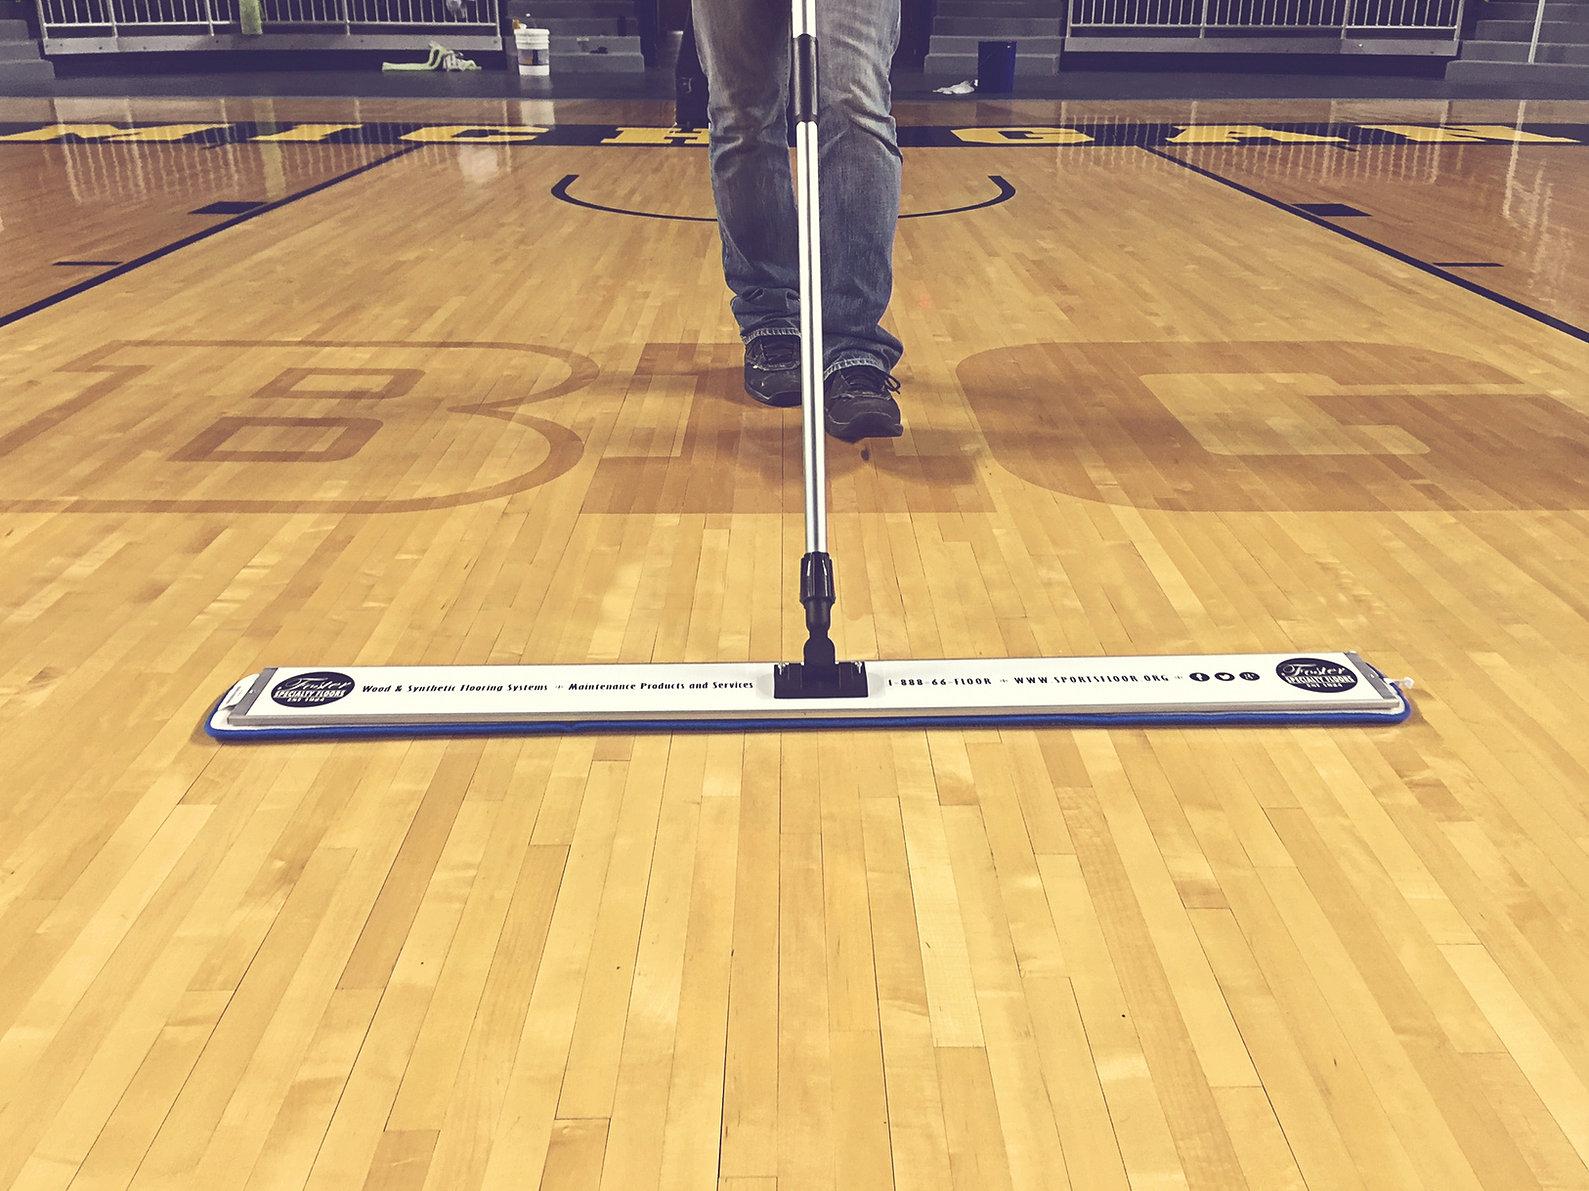 hardwood and rubber sports flooring gym floor maintenance. Black Bedroom Furniture Sets. Home Design Ideas